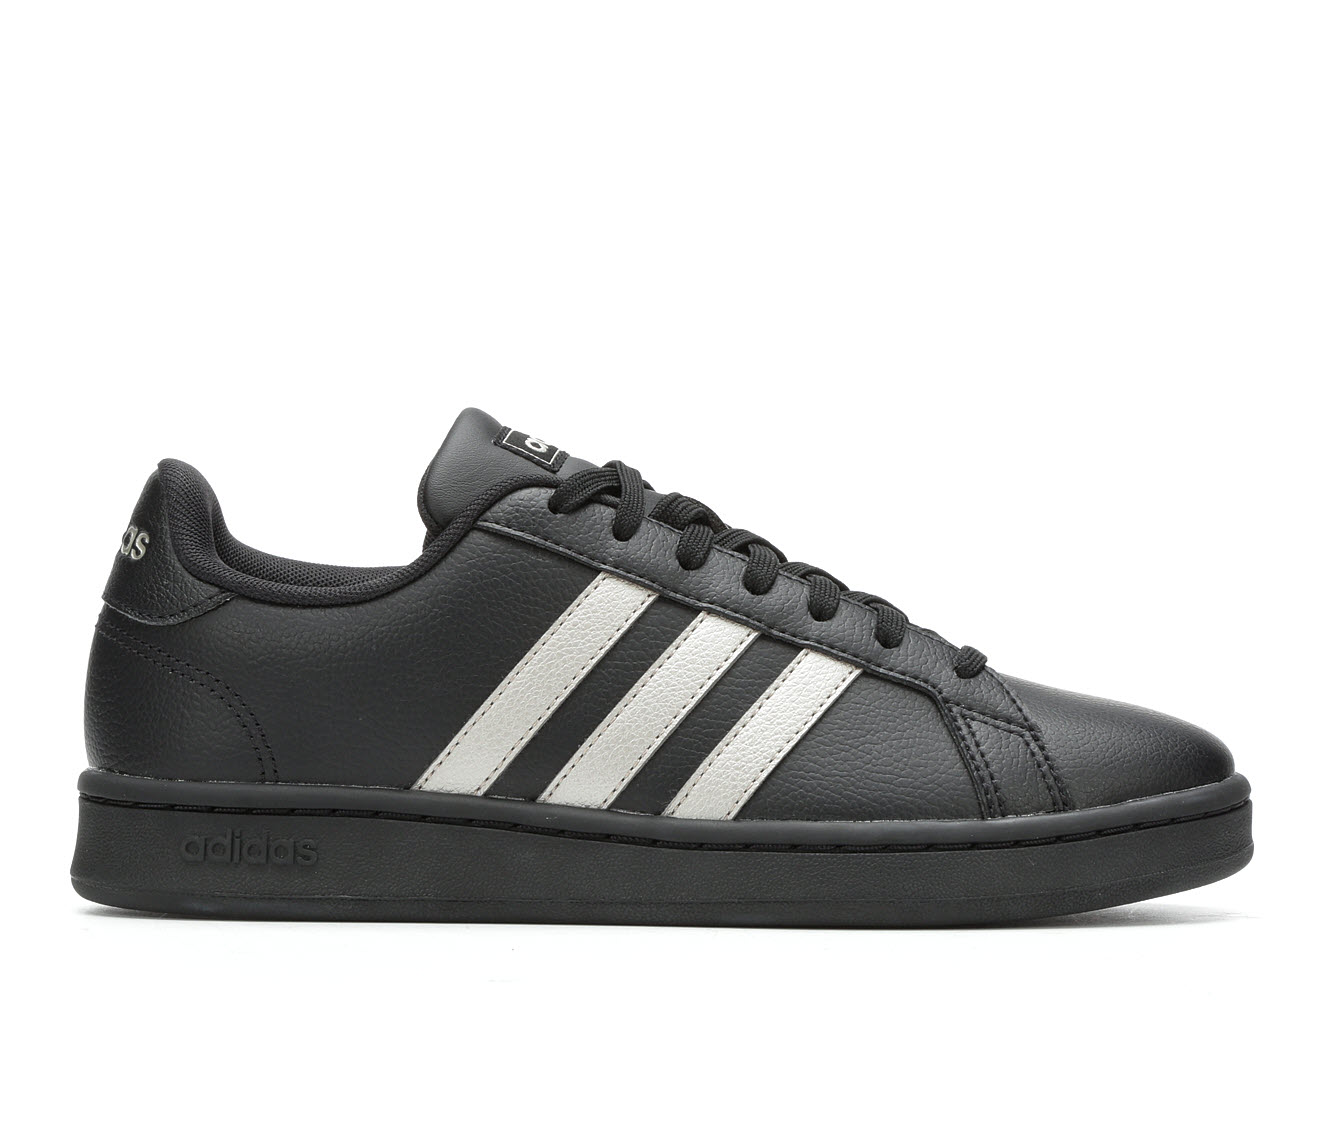 Adidas Grand Court Women's Athletic Shoe (Black)